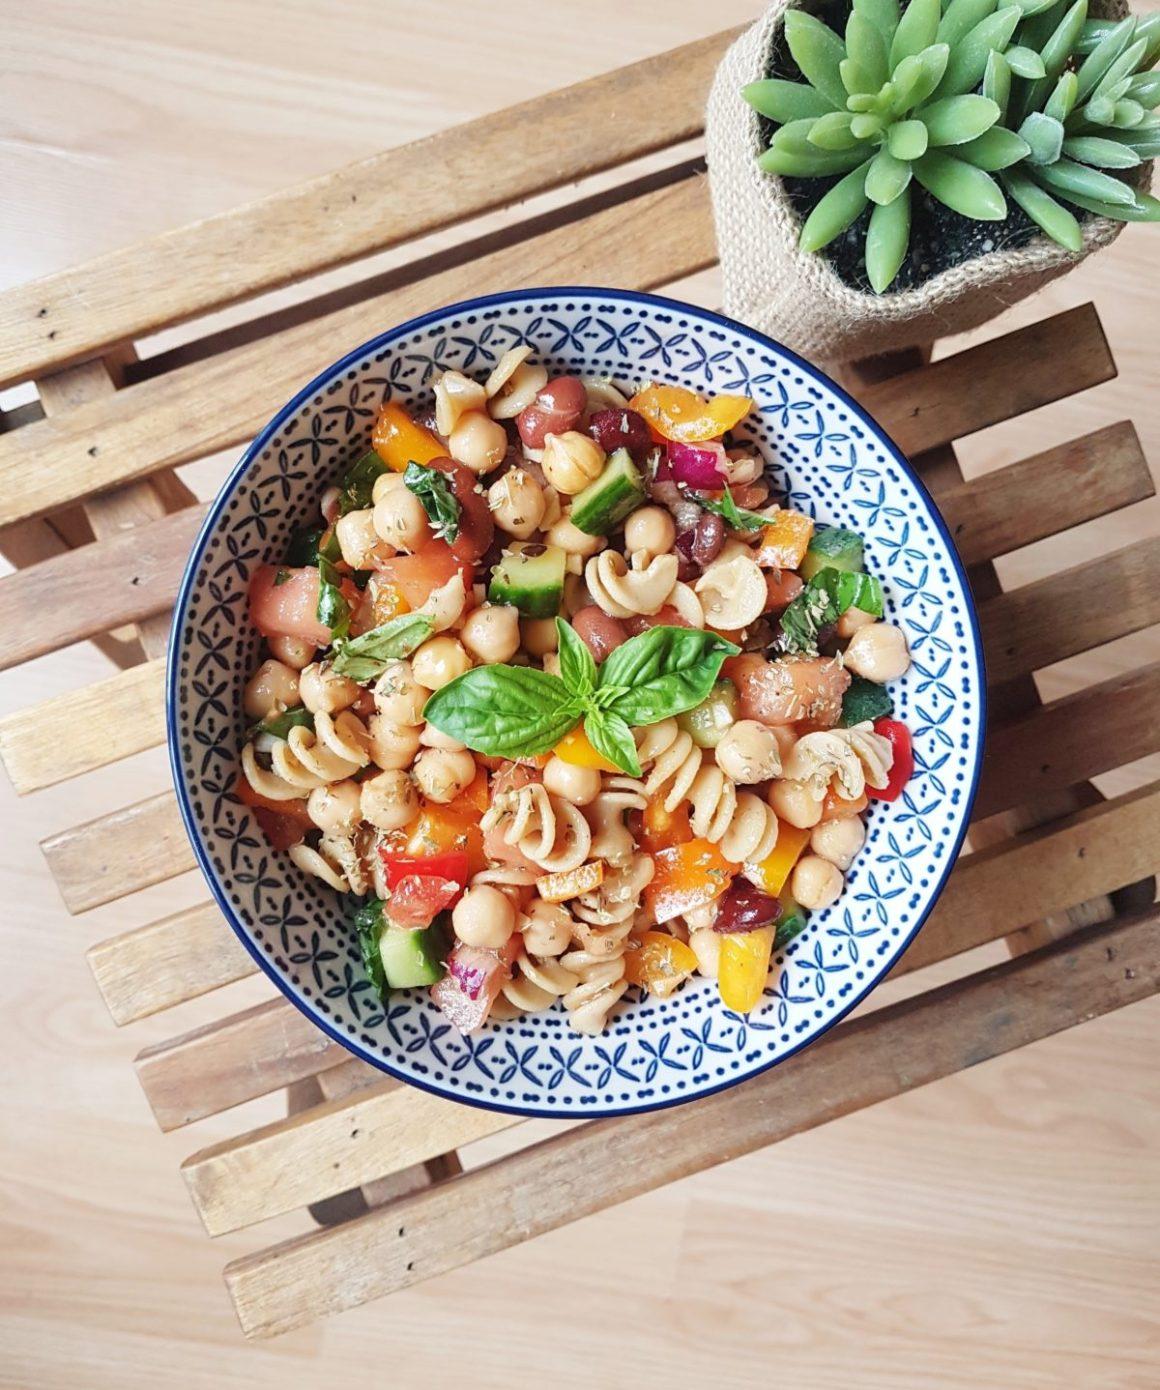 Salade de pâtes et légumineuses